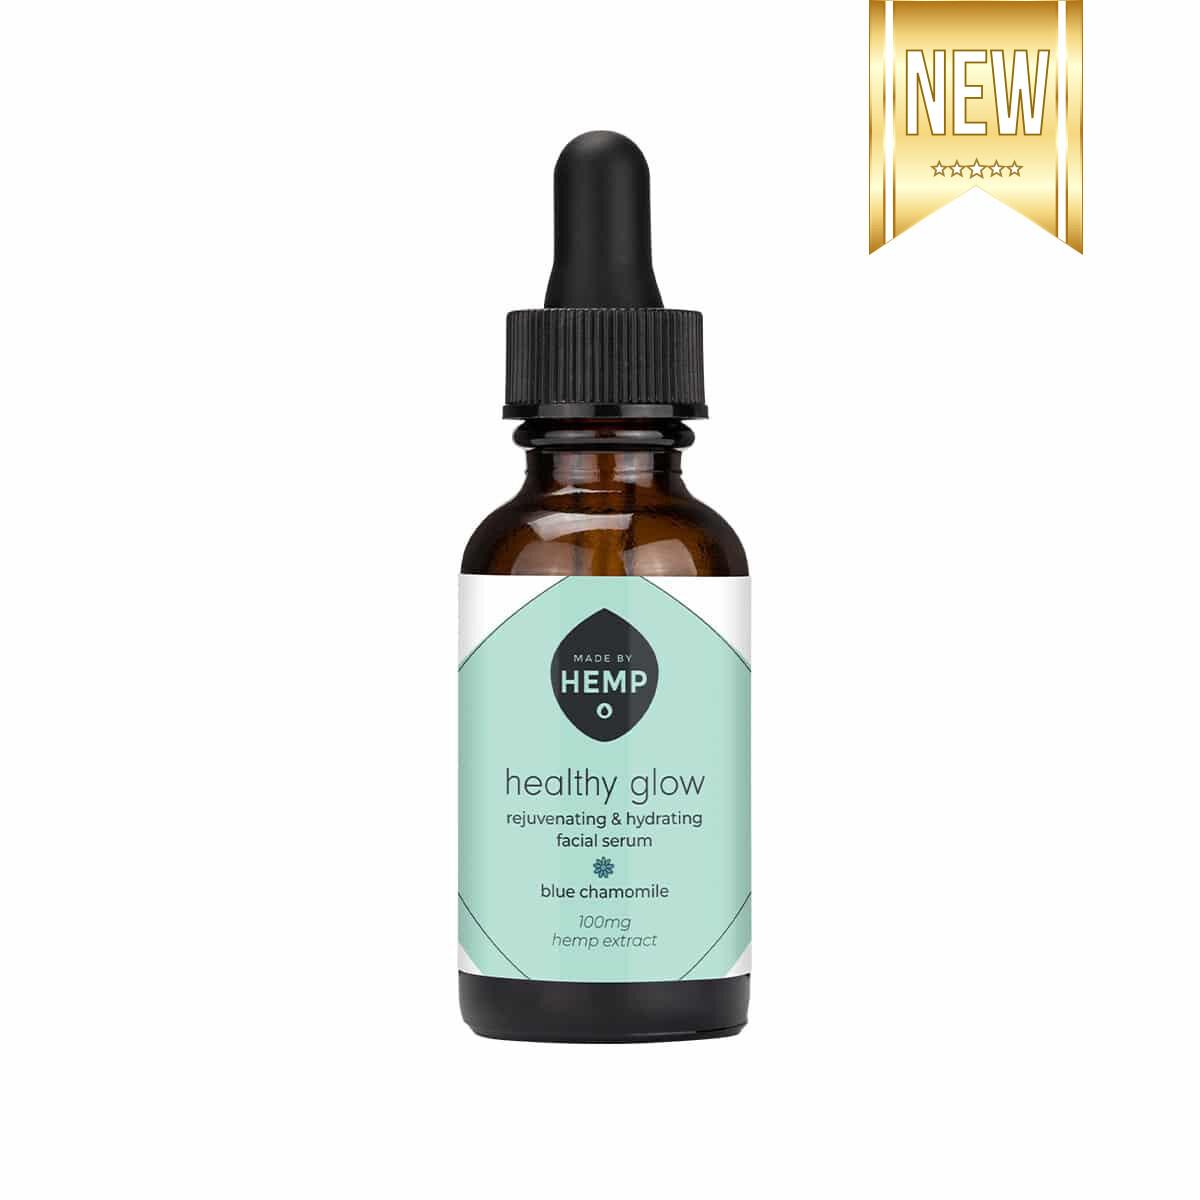 Made By Hemp – Healthy Glow CBD Face Serum 1oz (100mg CBD)